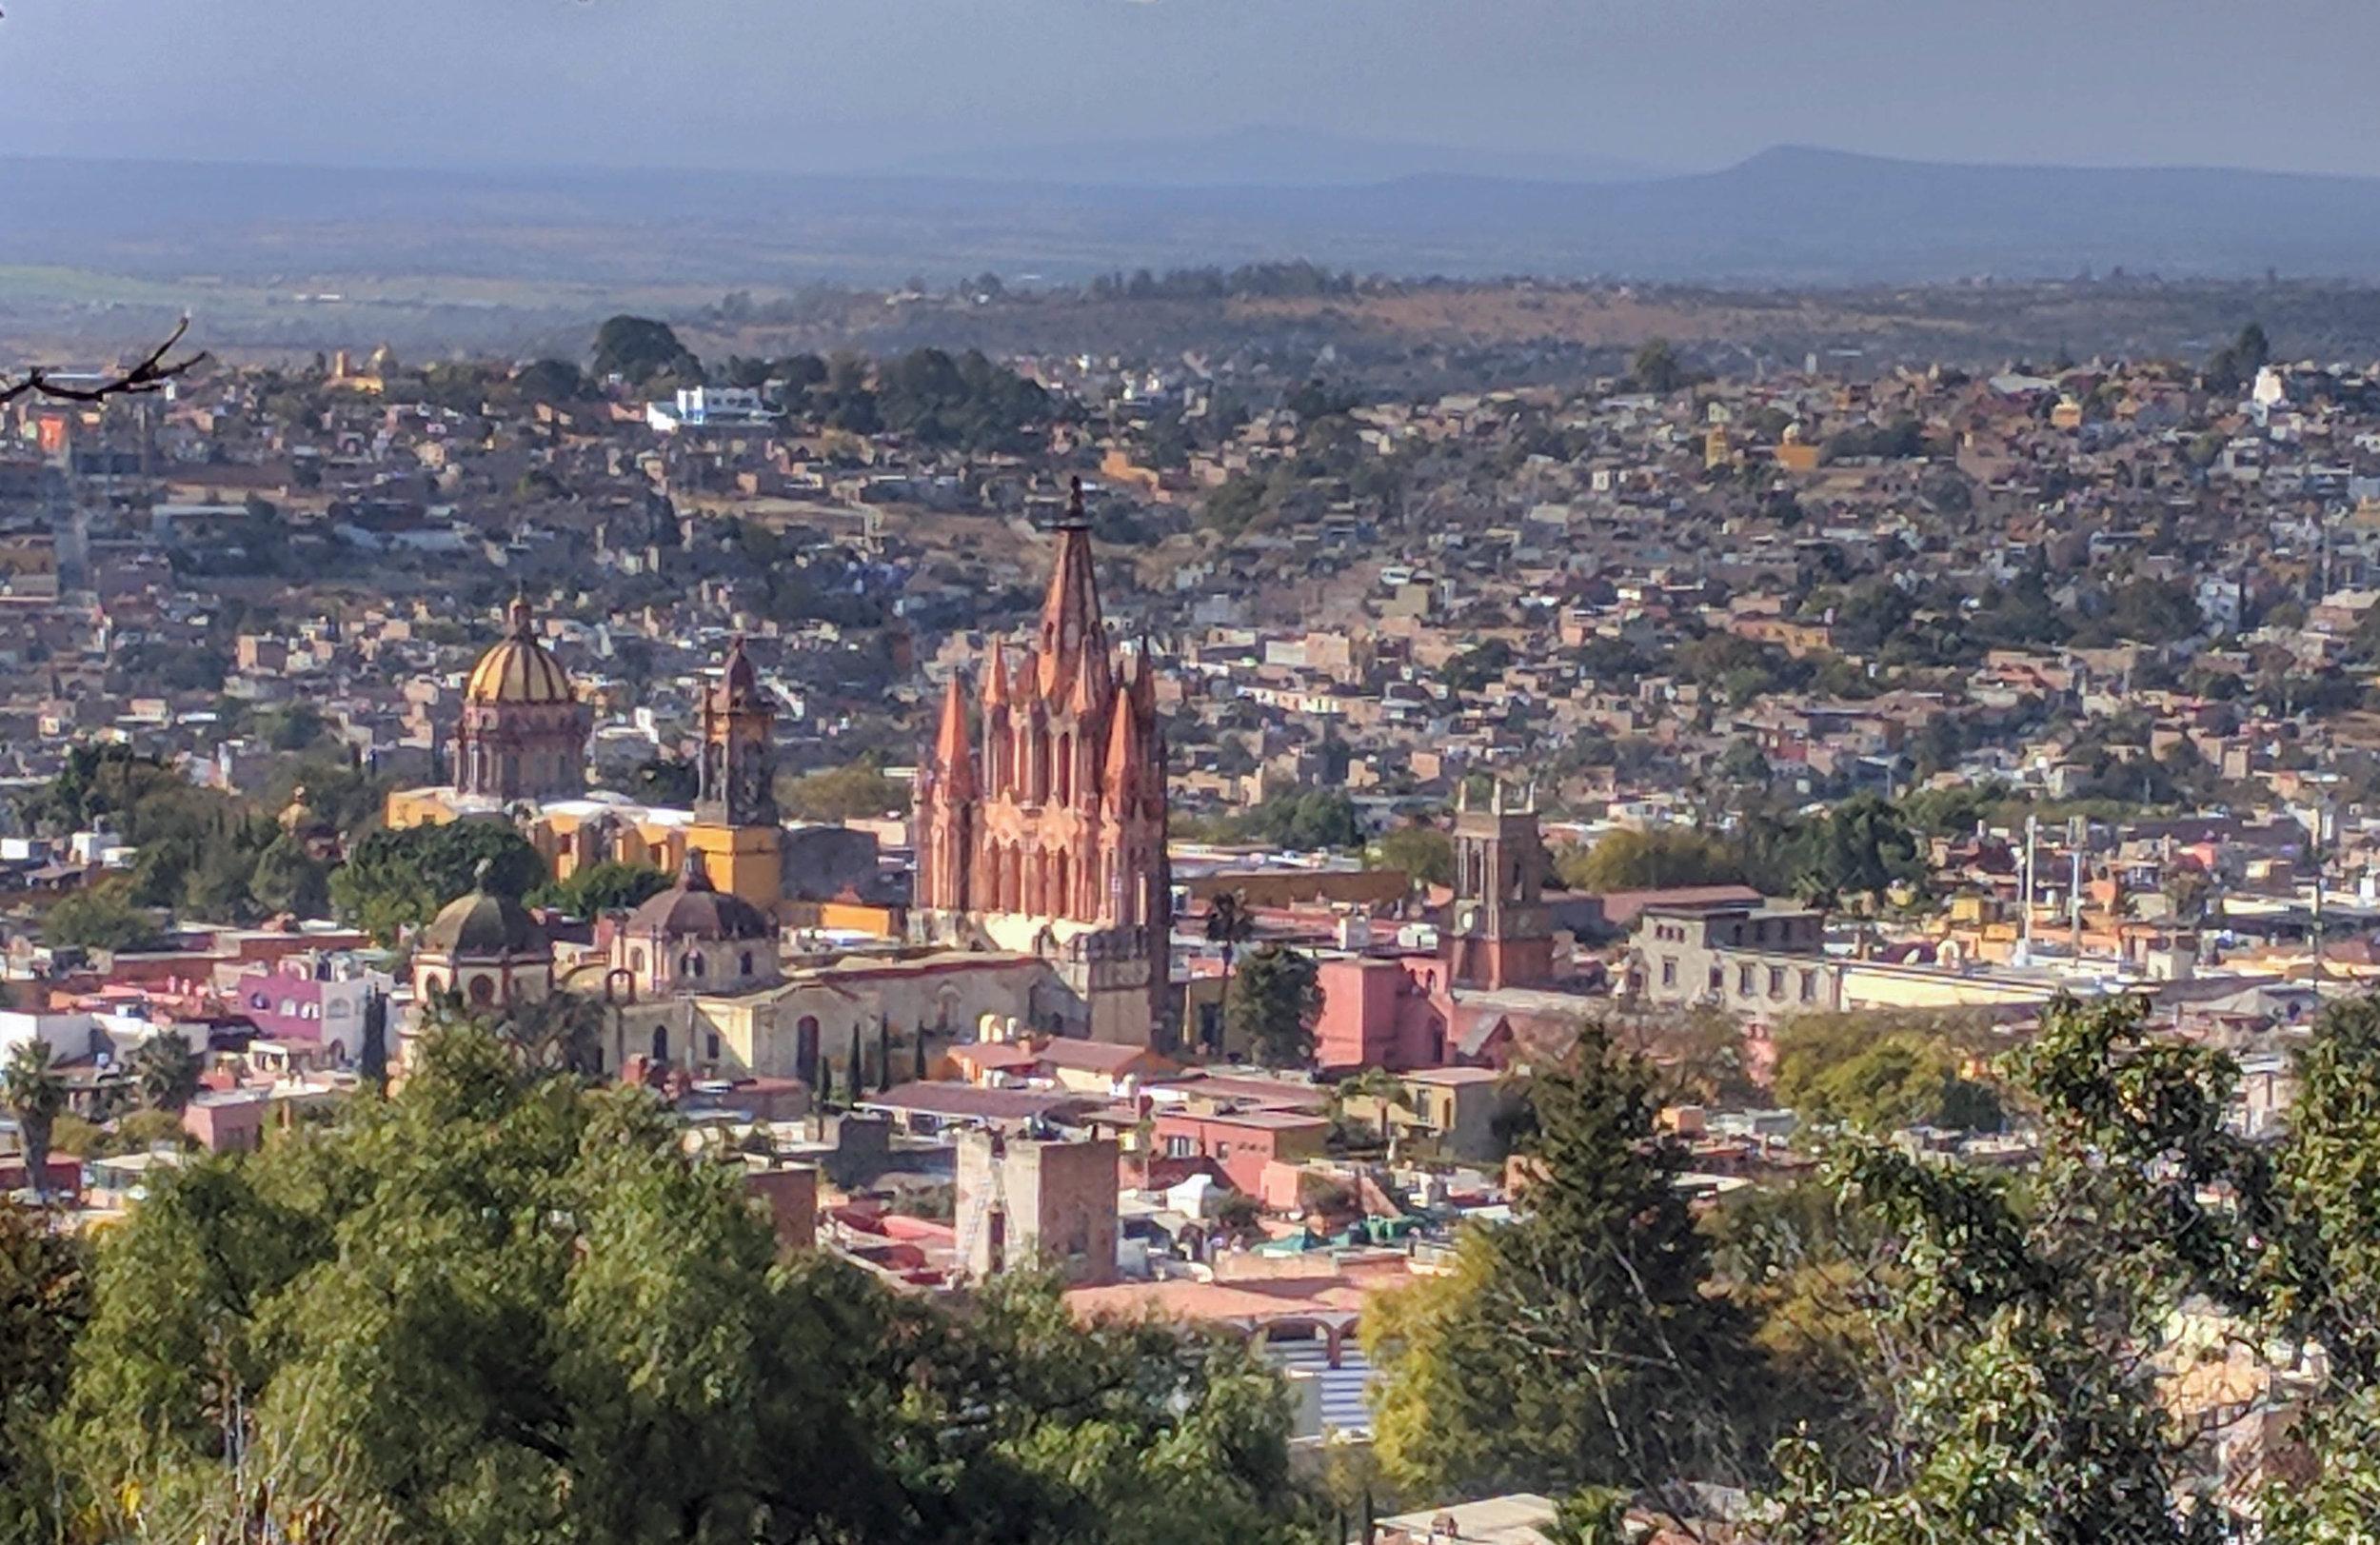 Lovely San Miguel de Allende